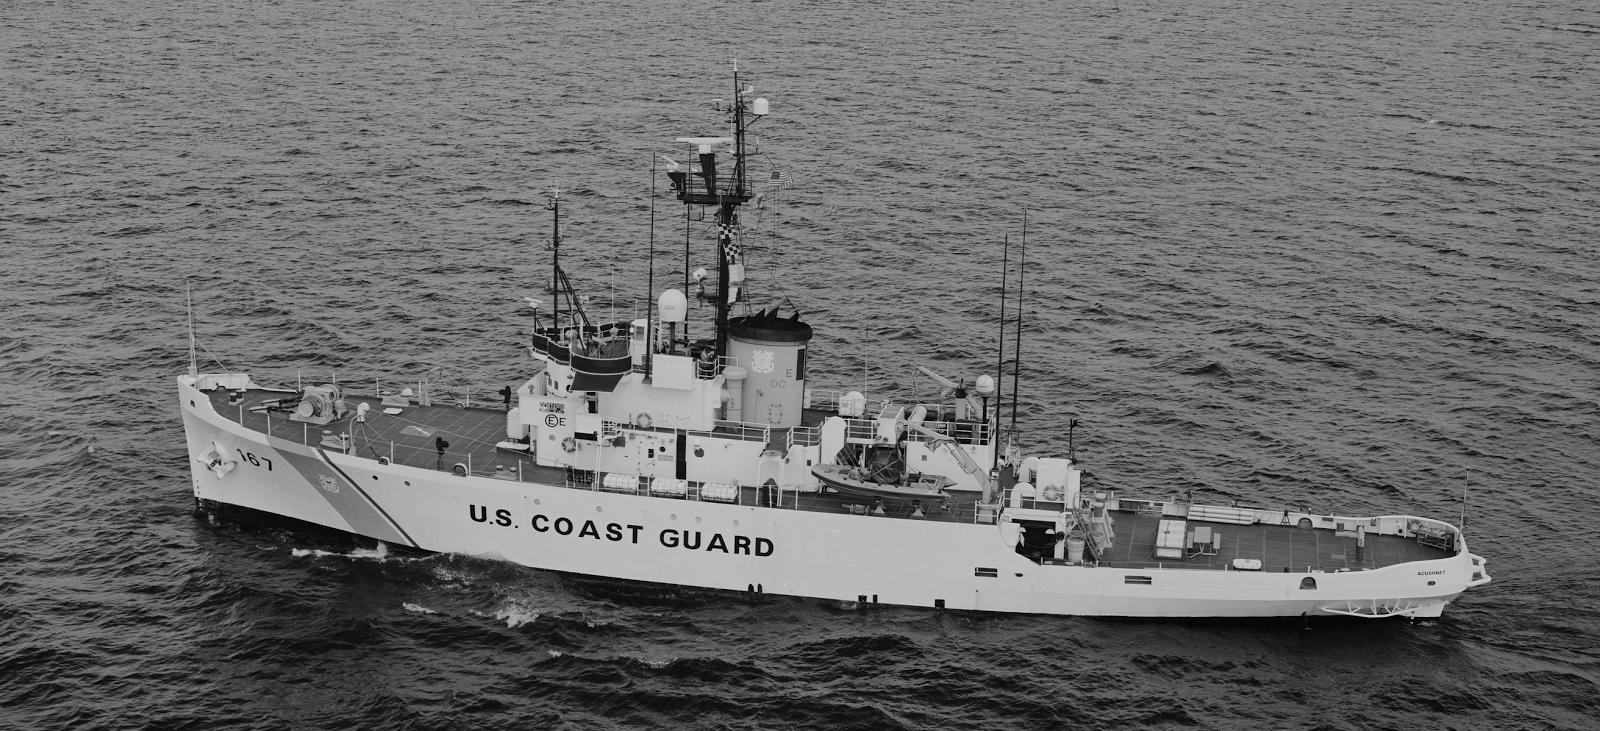 Free Ship Plans, USCG cutter Acushnet, USS Shackle, salvage, world war II, vessel